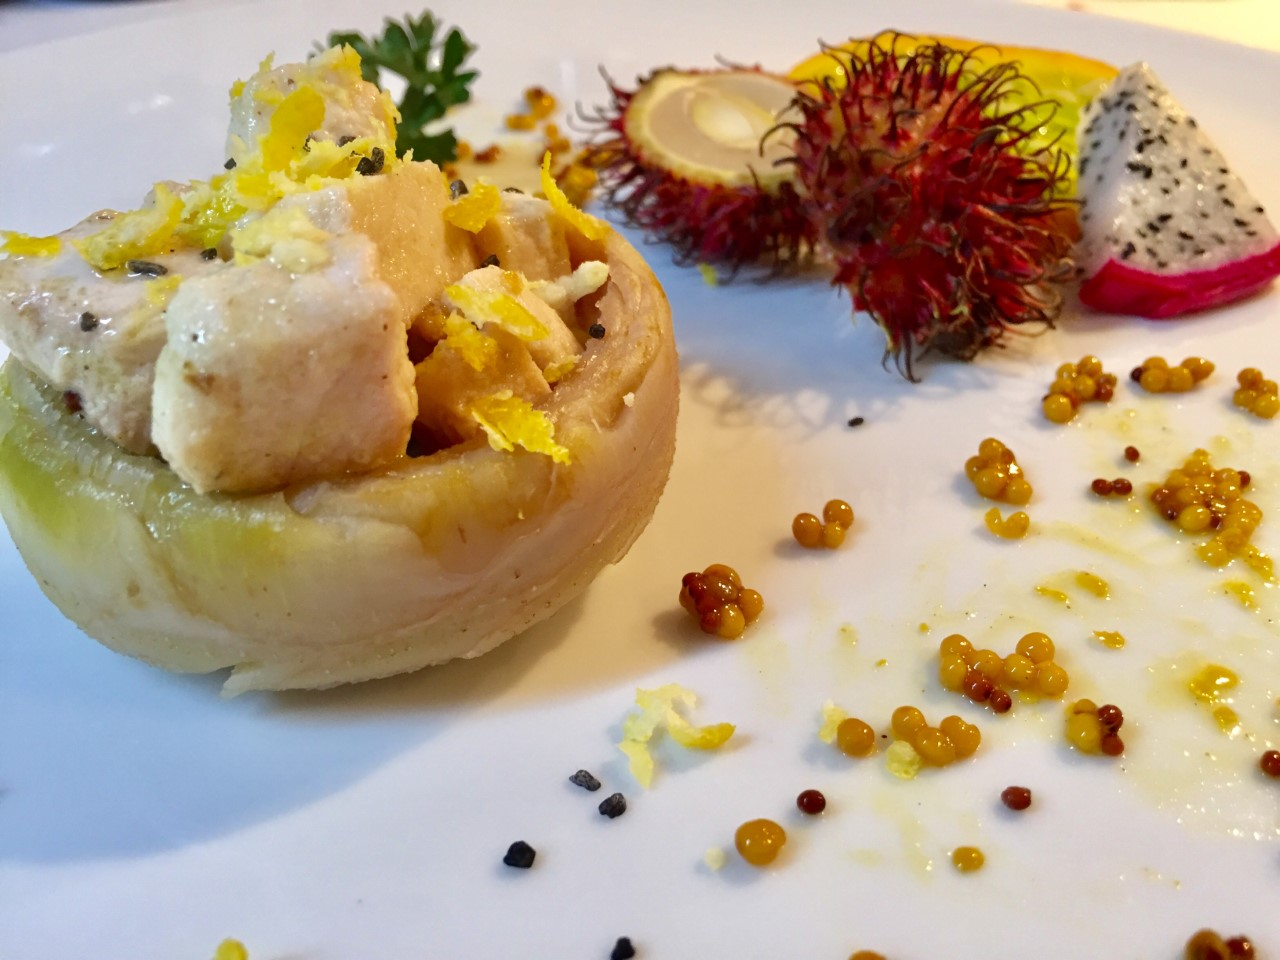 carciofi con spada limone e senape